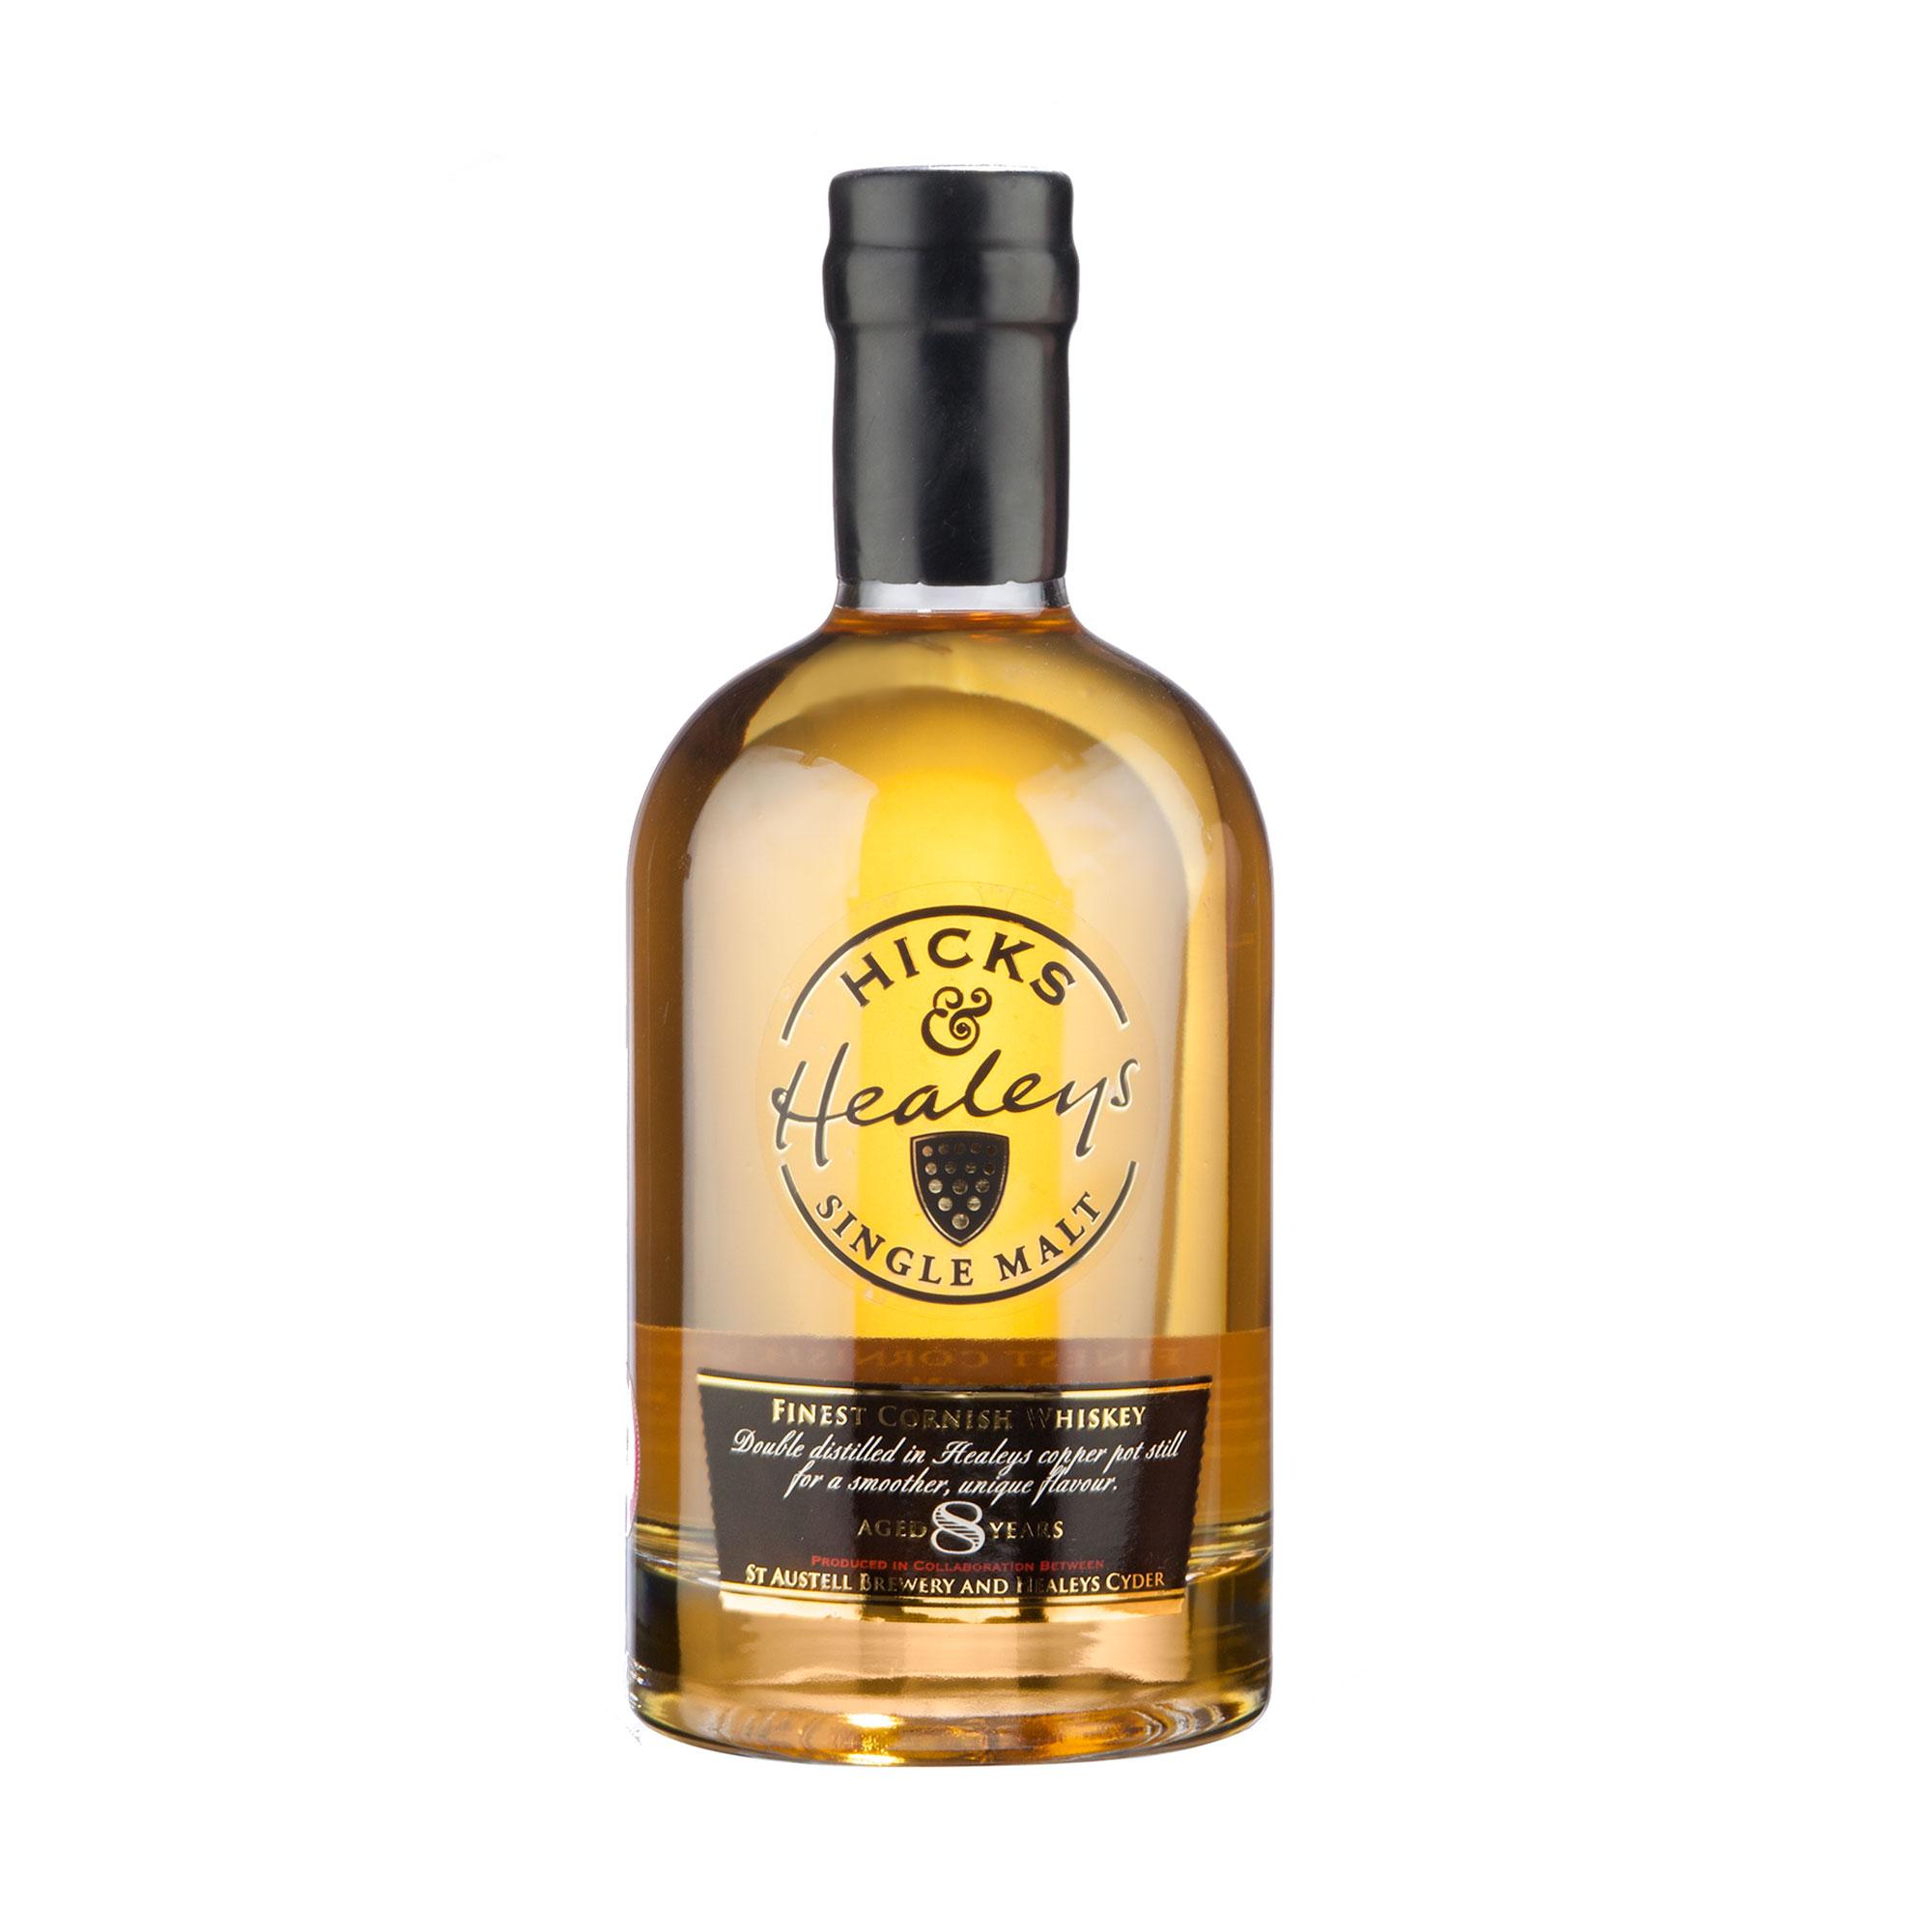 Hicks & Healeys Finest Whiskey